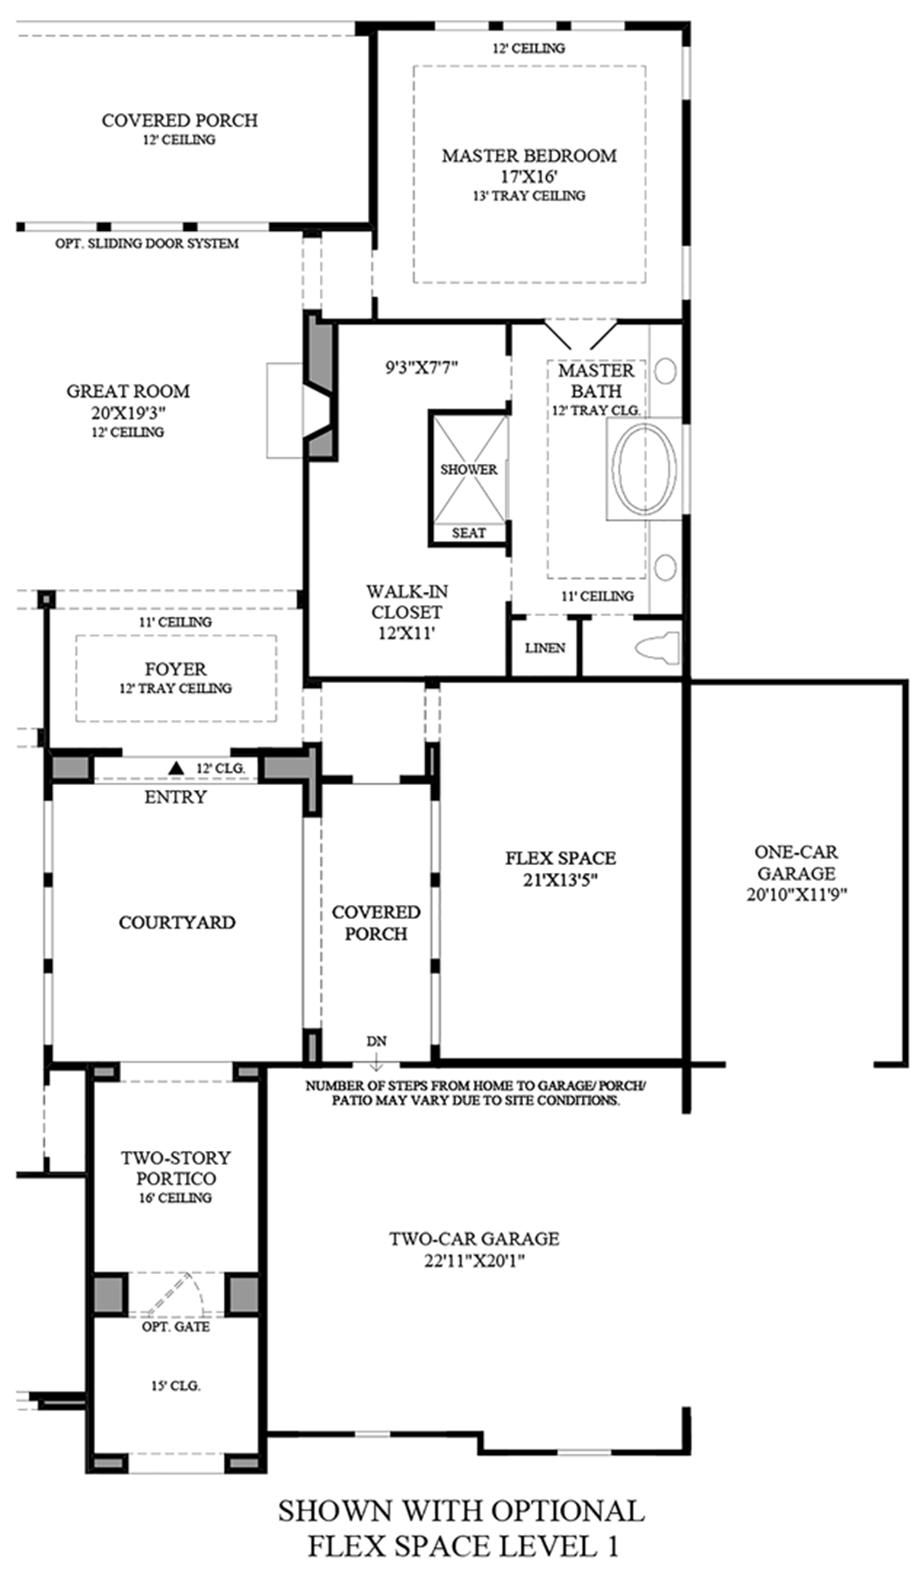 Optional Flex Space Level 1 Floor Plan